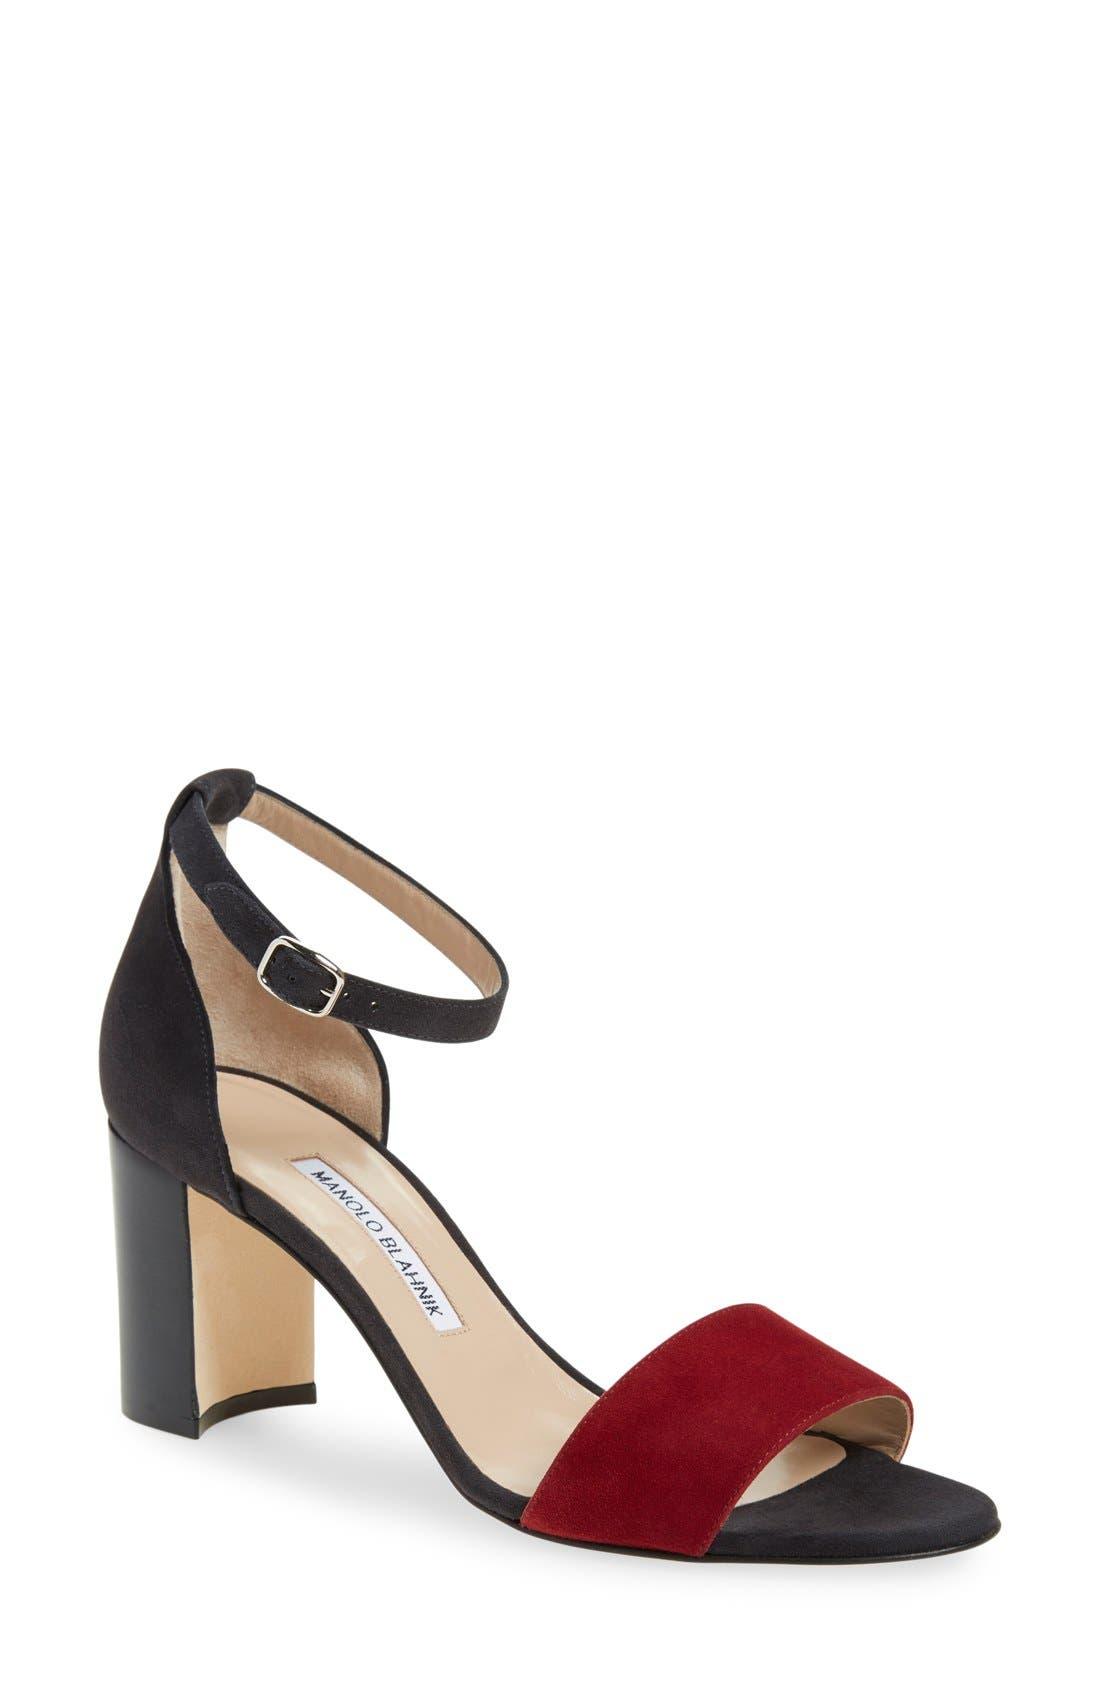 Main Image - Manolo Blahnik 'Lauratomod' Ankle Strap Sandal (Women)